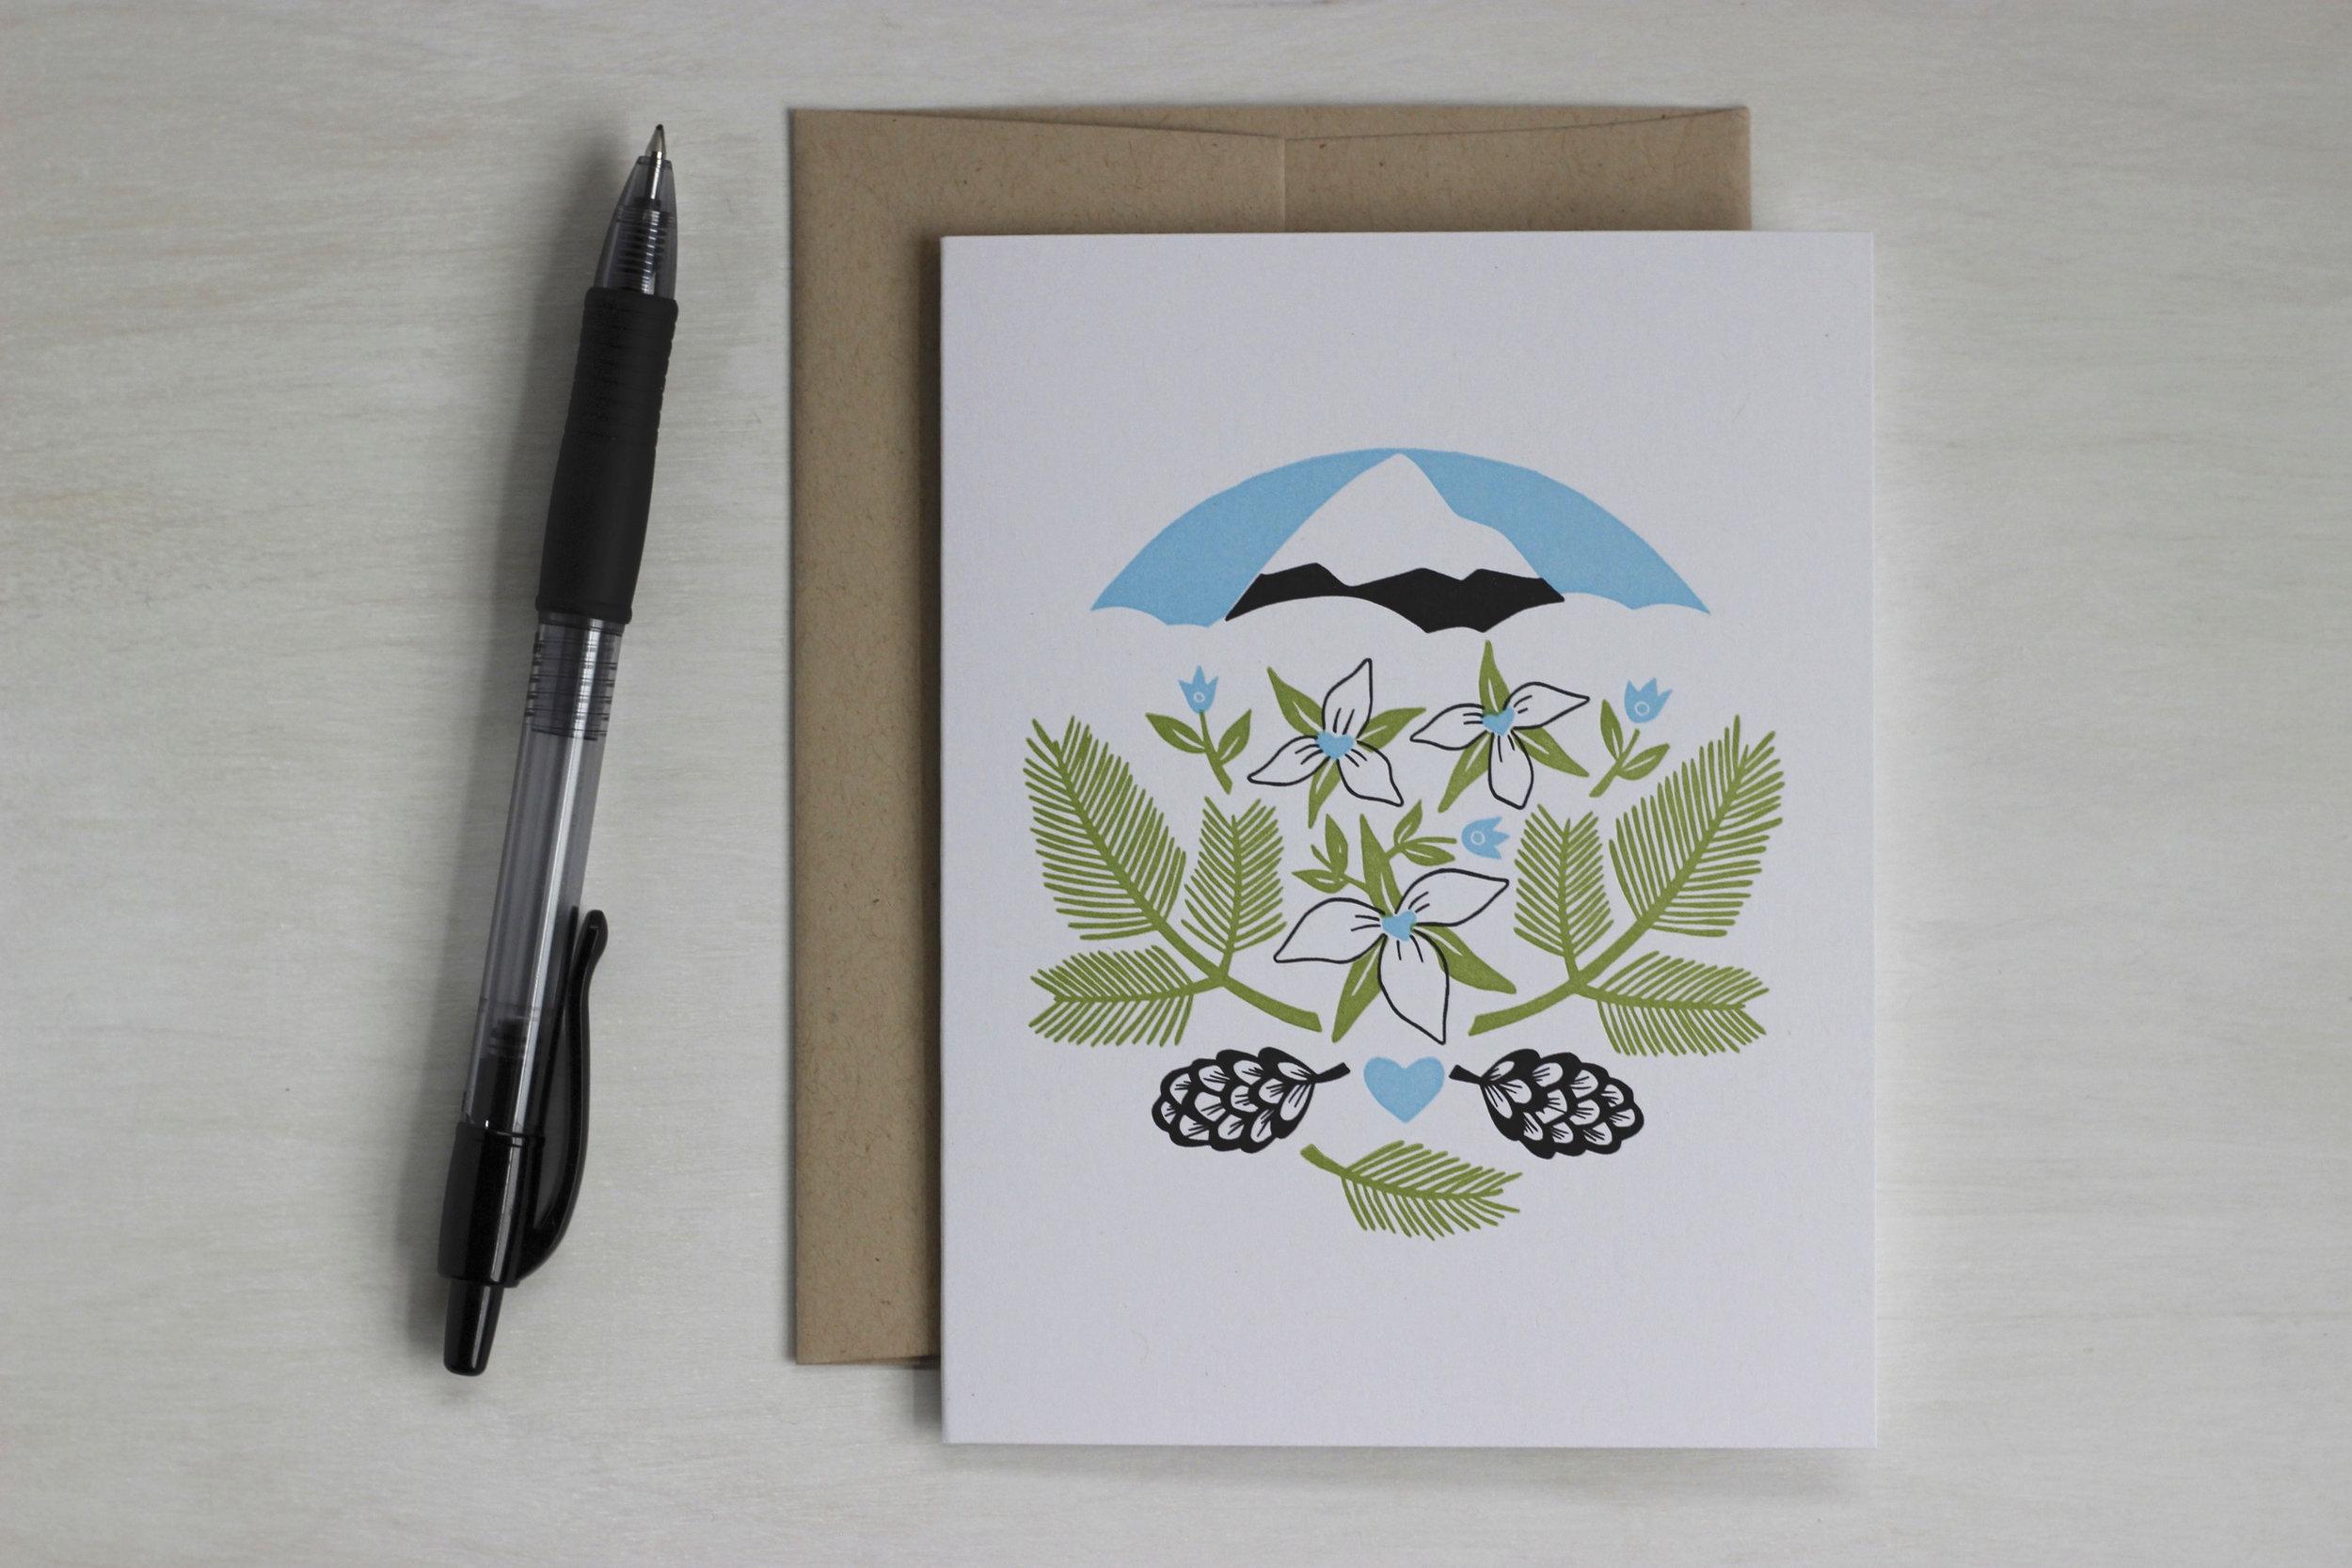 Trillium and Mt. Hood letterpress greeting card